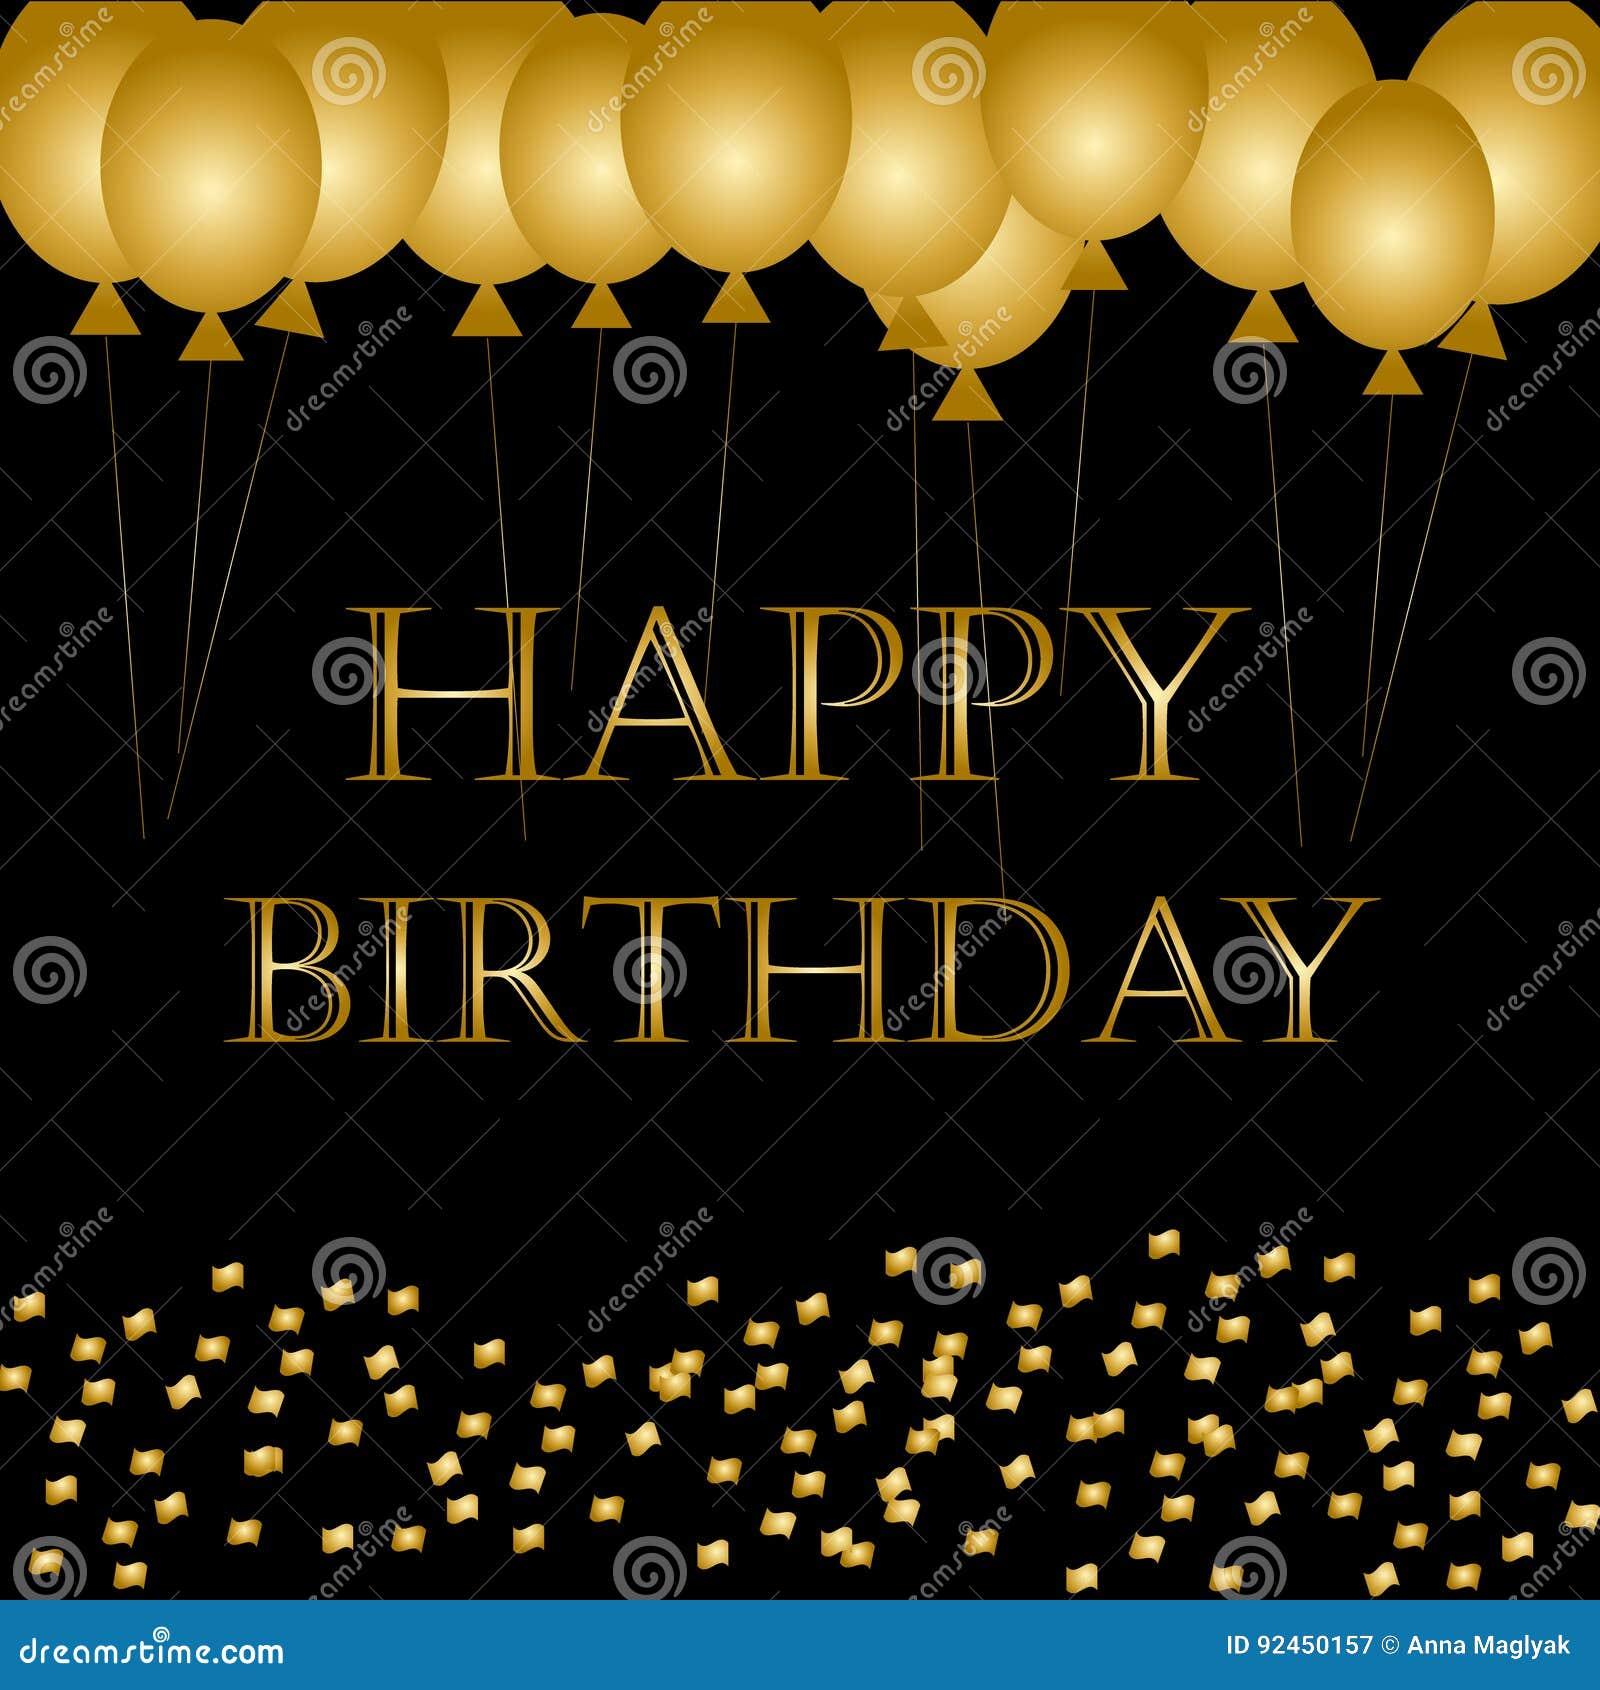 Balloons Happy Birthday On Black. Gold Balloon Sparkles